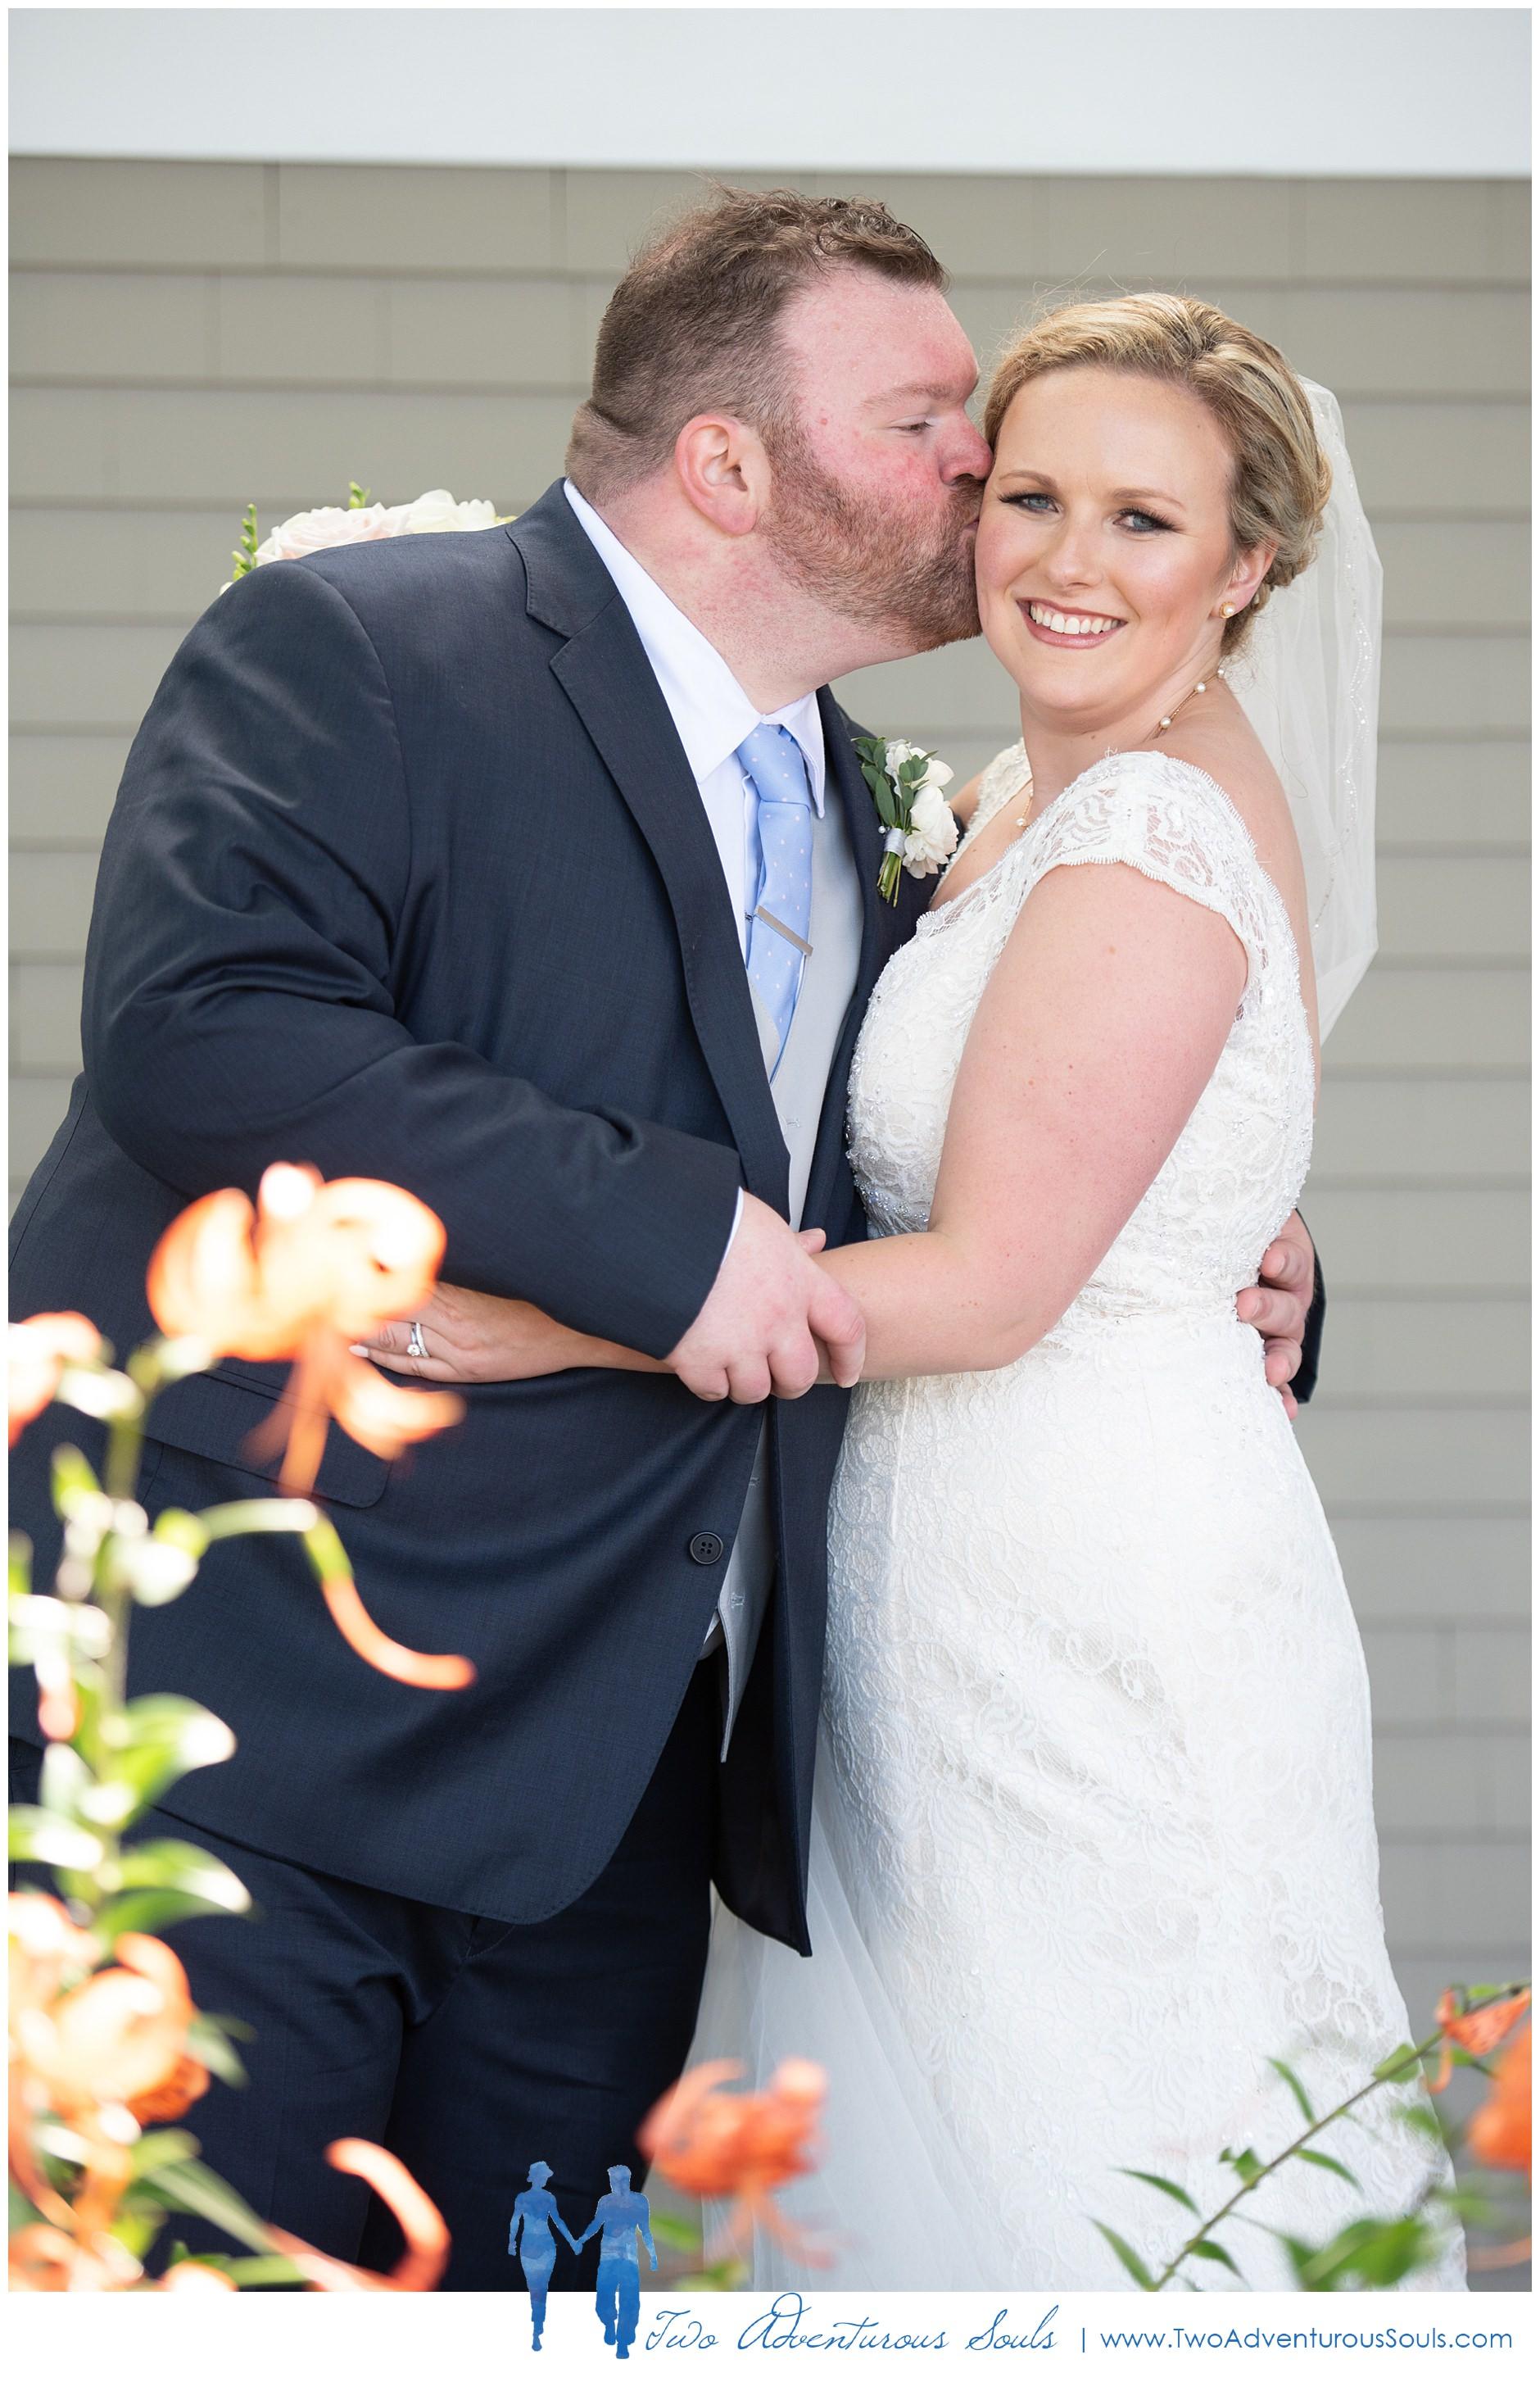 Cape Cod Wedding Photographers, Destination Wedding Photographers, Two Adventurous Souls-081019_0034.jpg